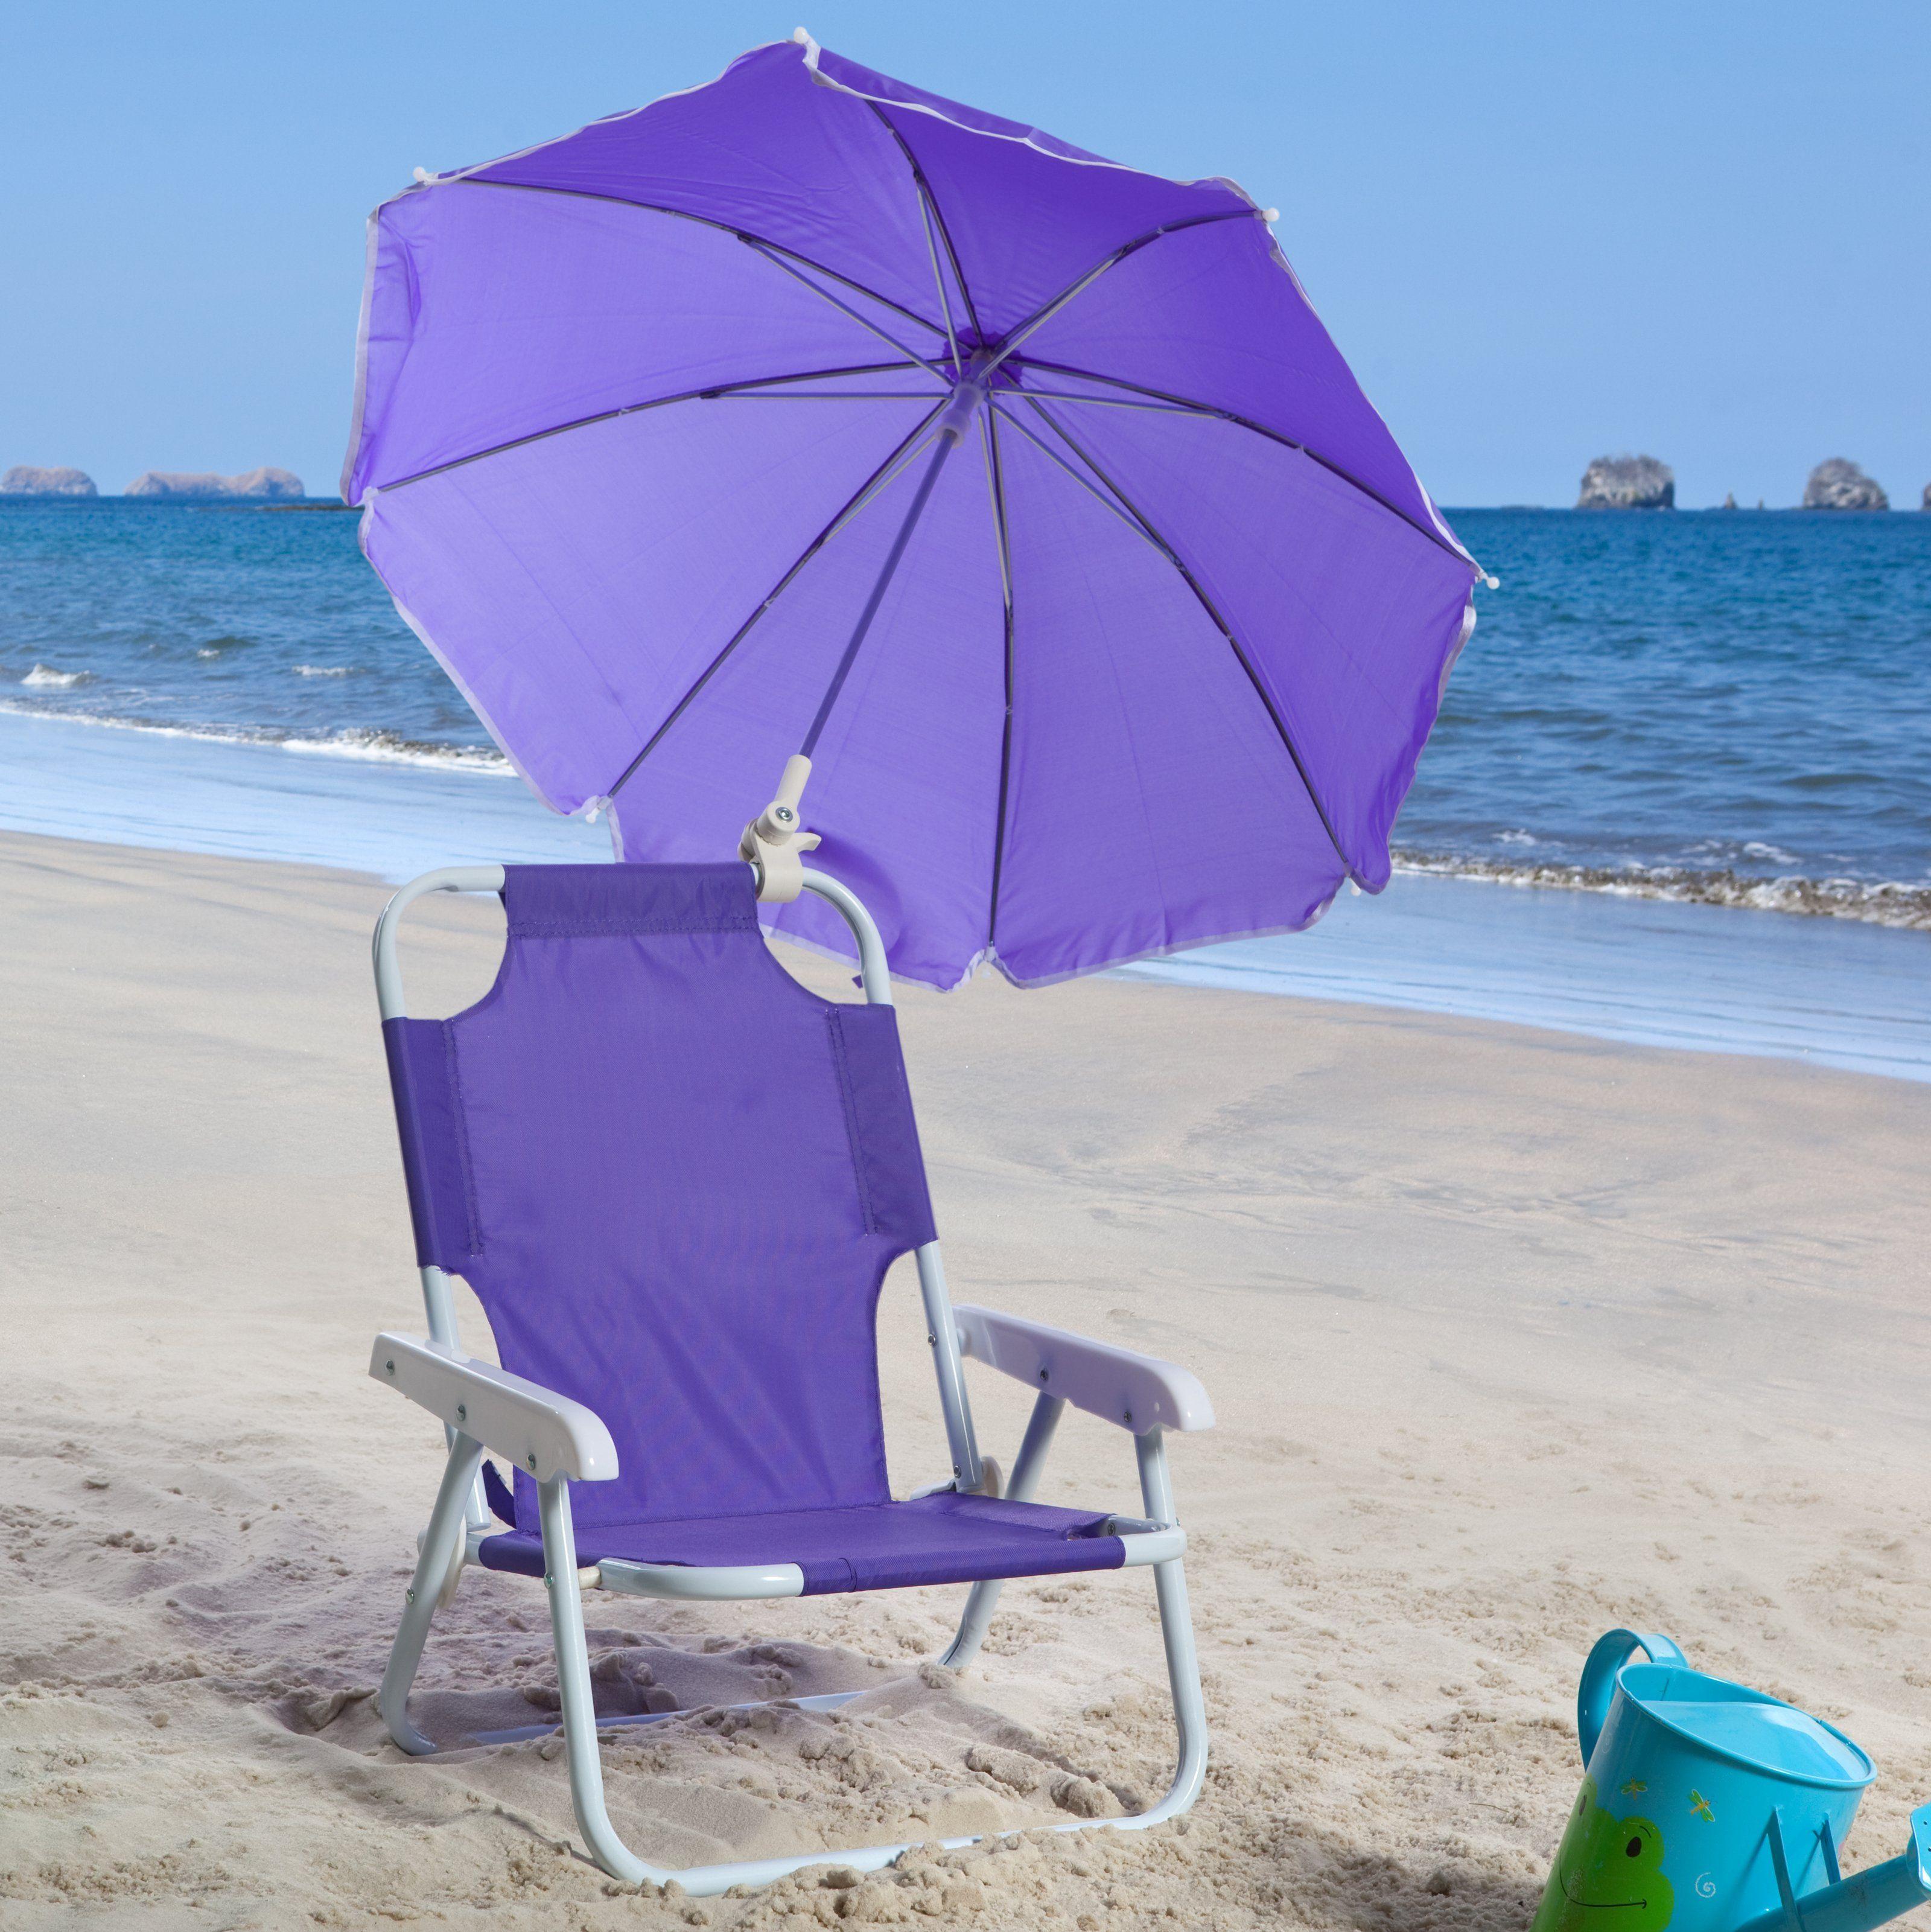 Have To Have It Kids Purple Beach Chair Umbrella 32 99 Hayneedle Com Kids Beach Chair Beach Chair Umbrella Purple Beach